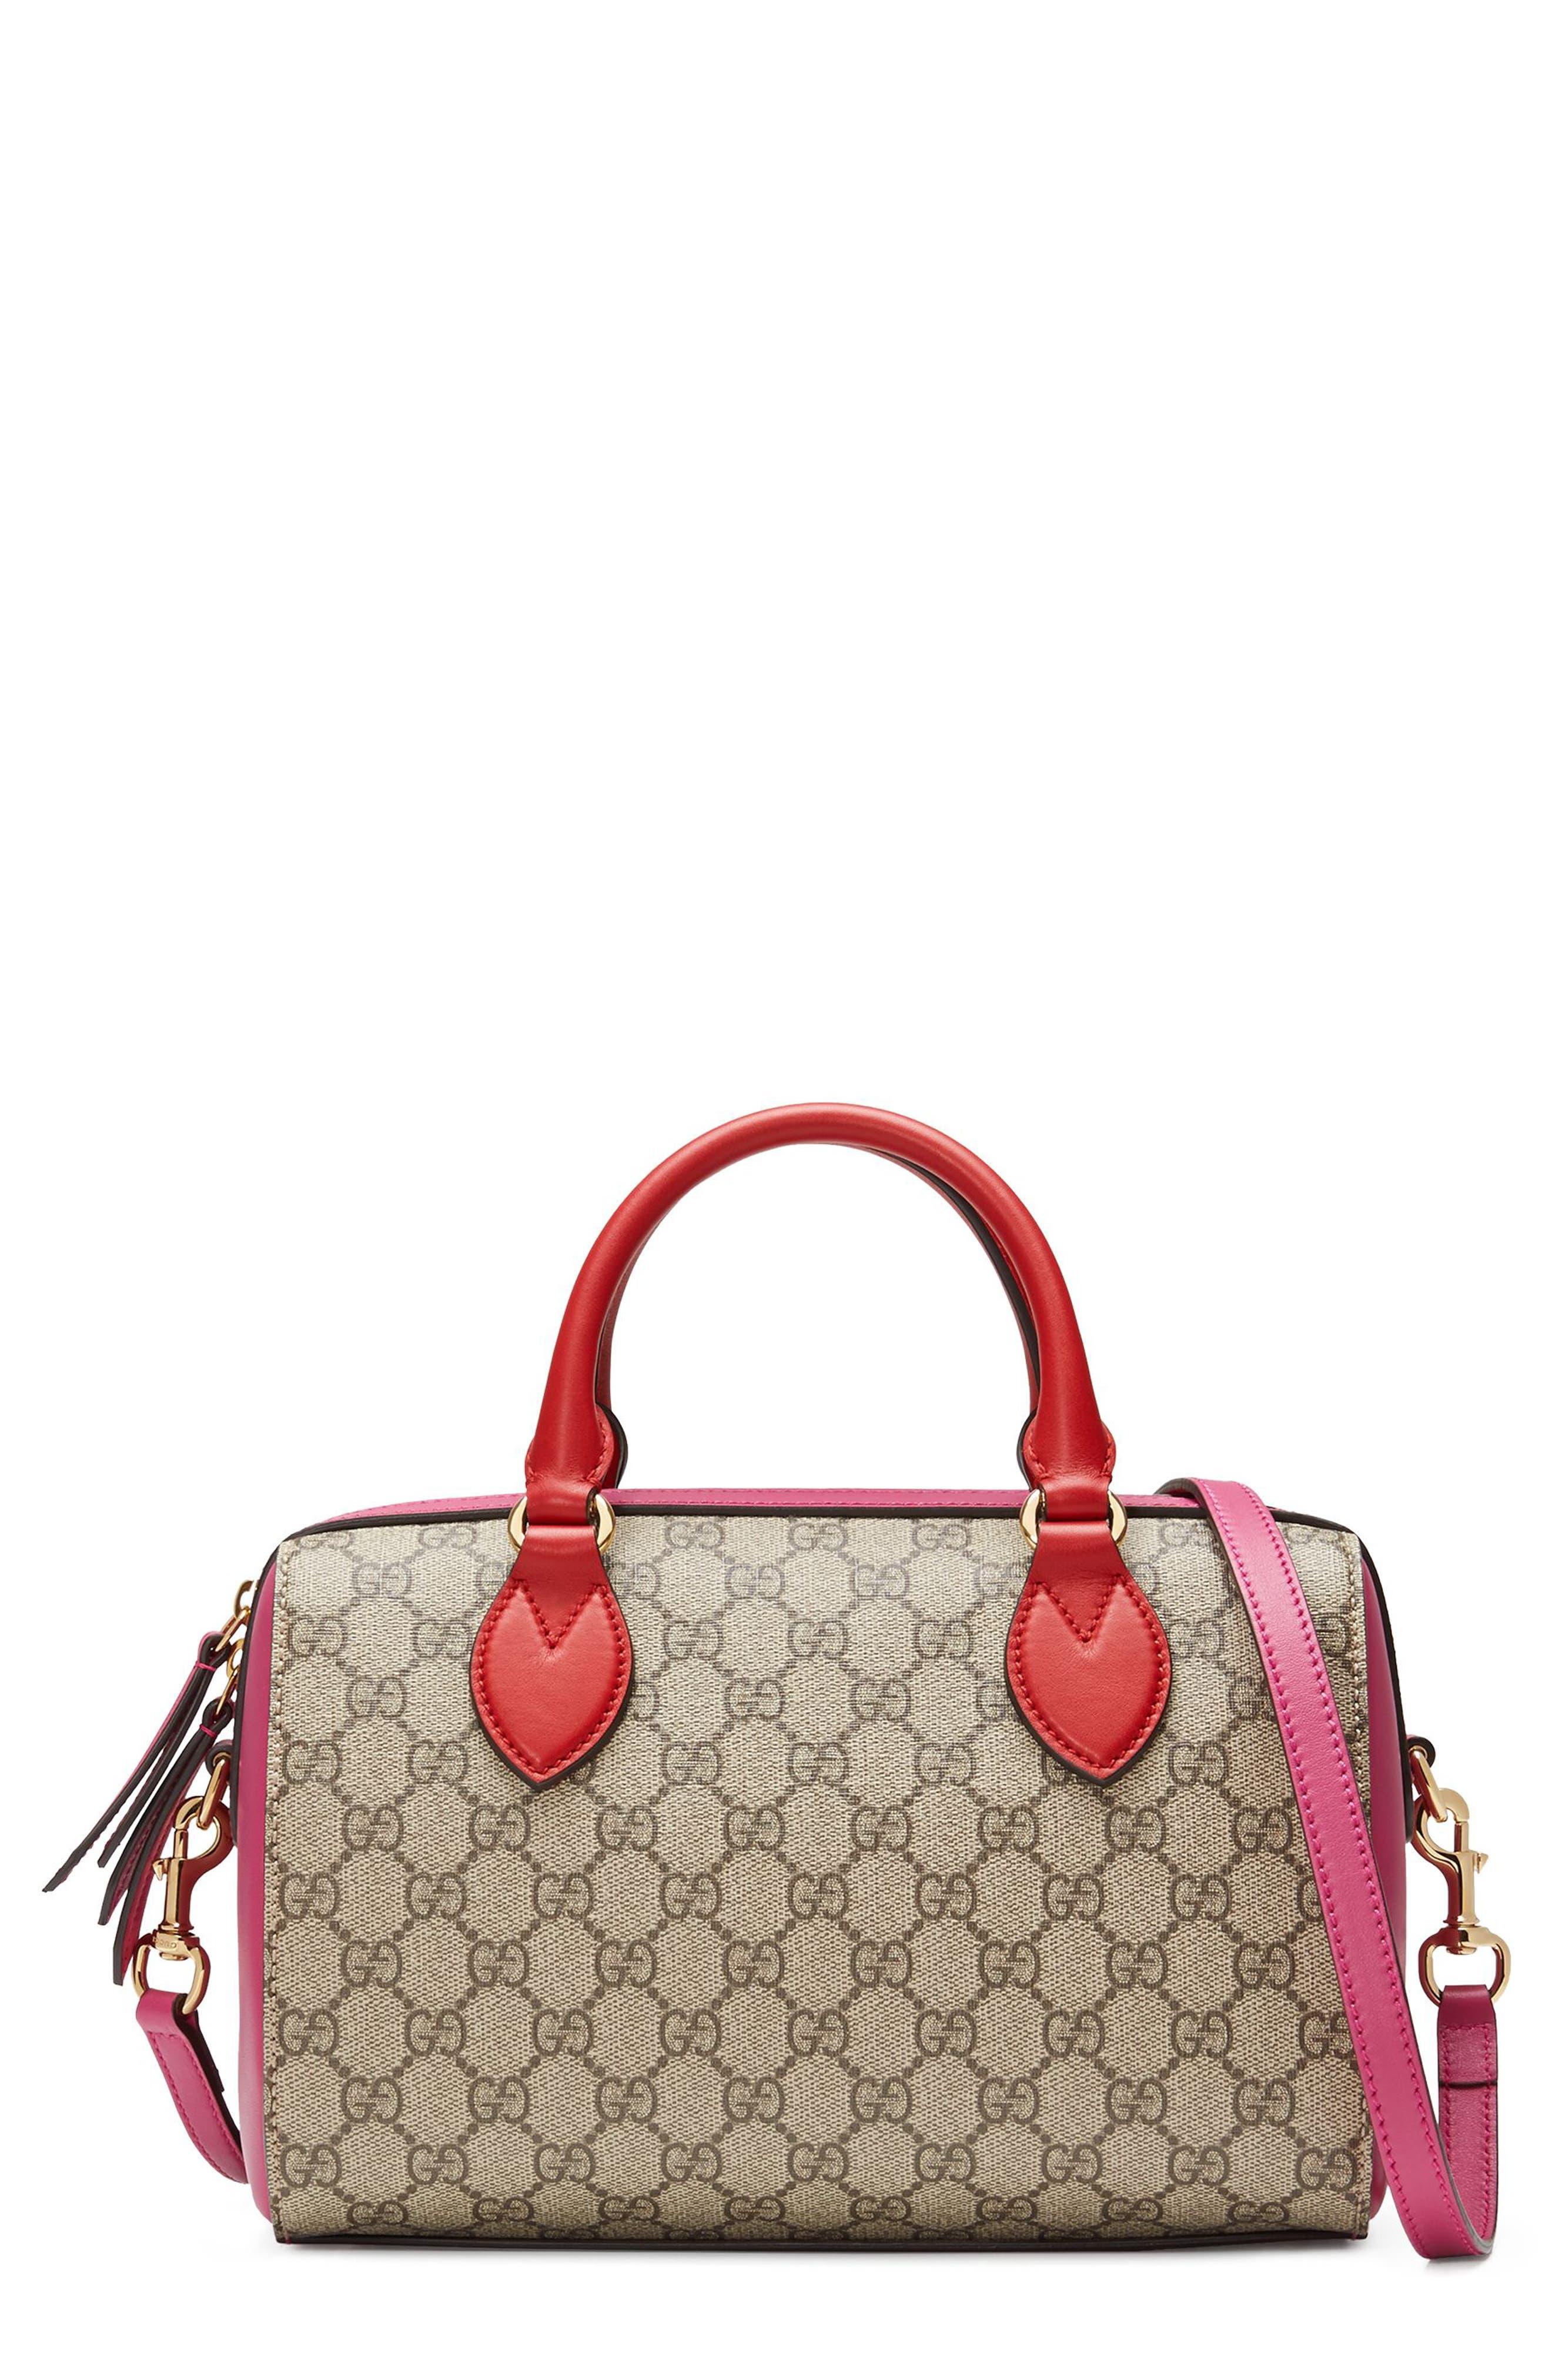 Gucci Top Handle GG Supreme Canvas & Leather Bag